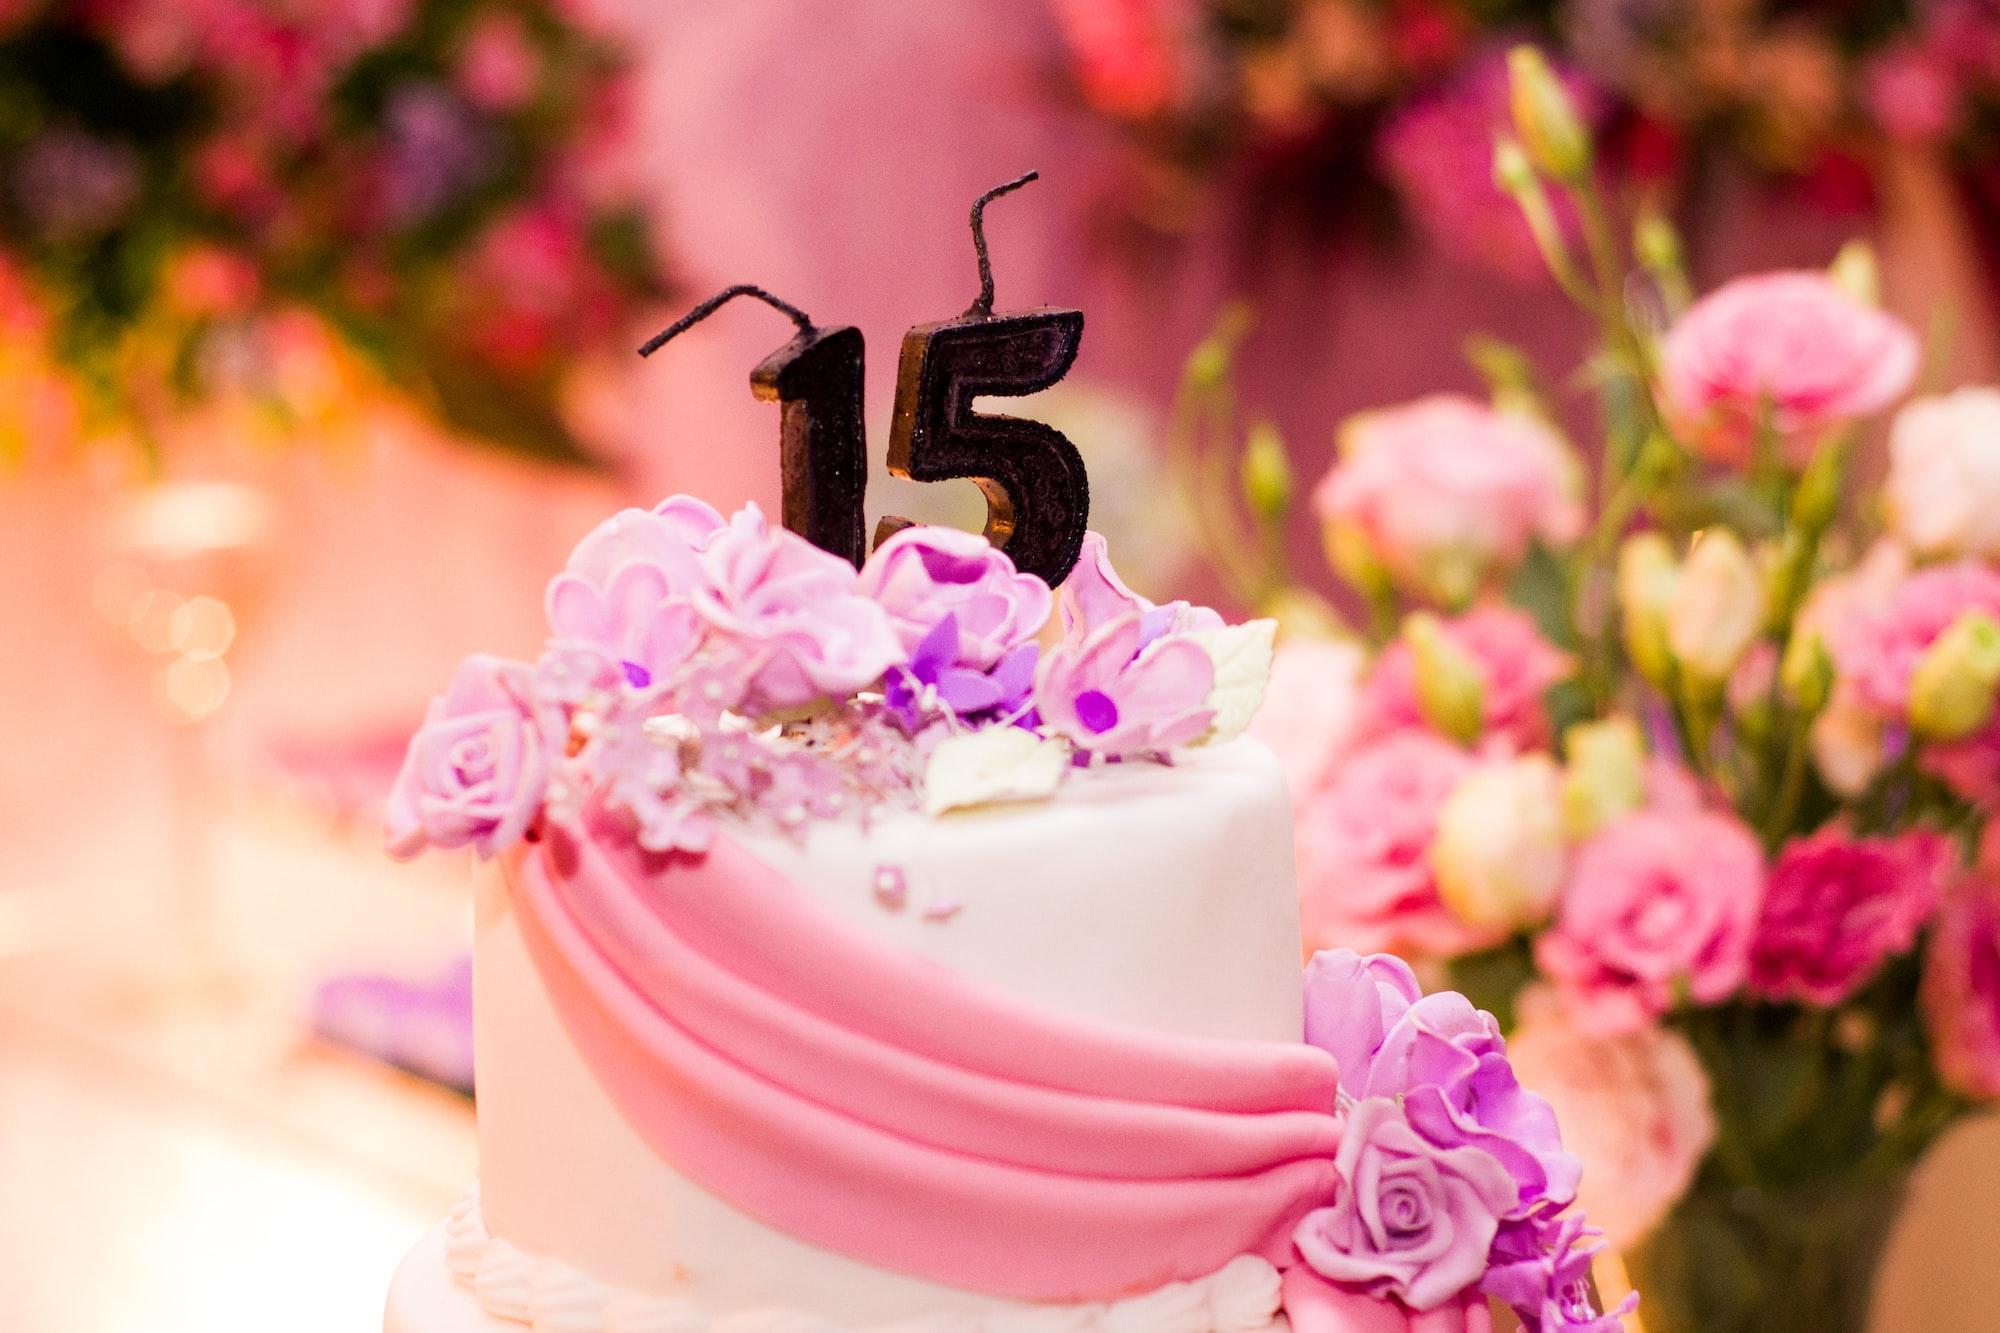 Fifteenth birthday cake